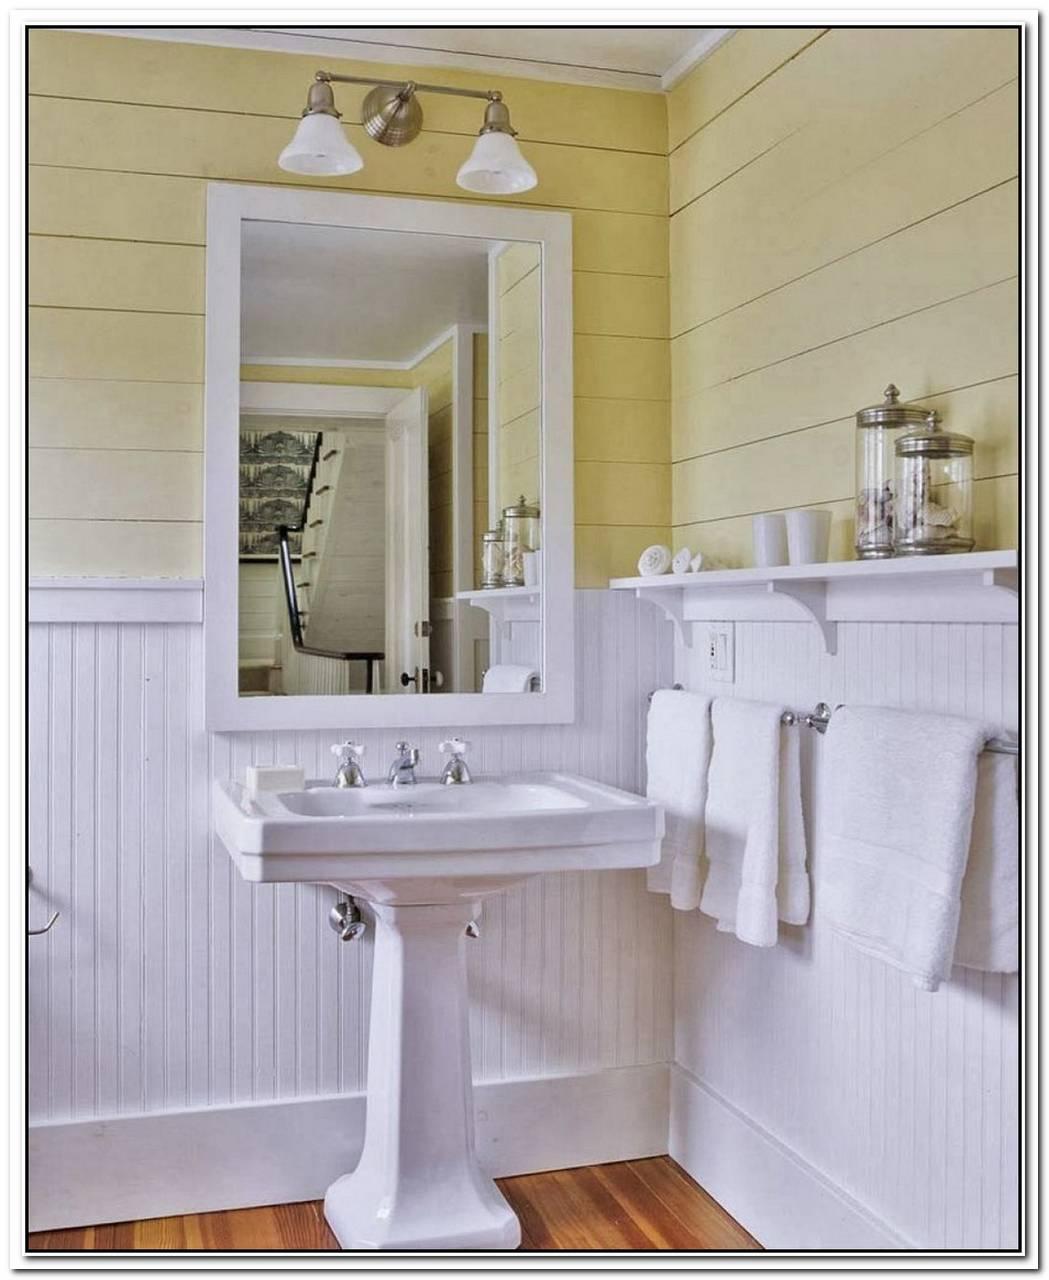 Original Vintage Bathroom Wainscoting